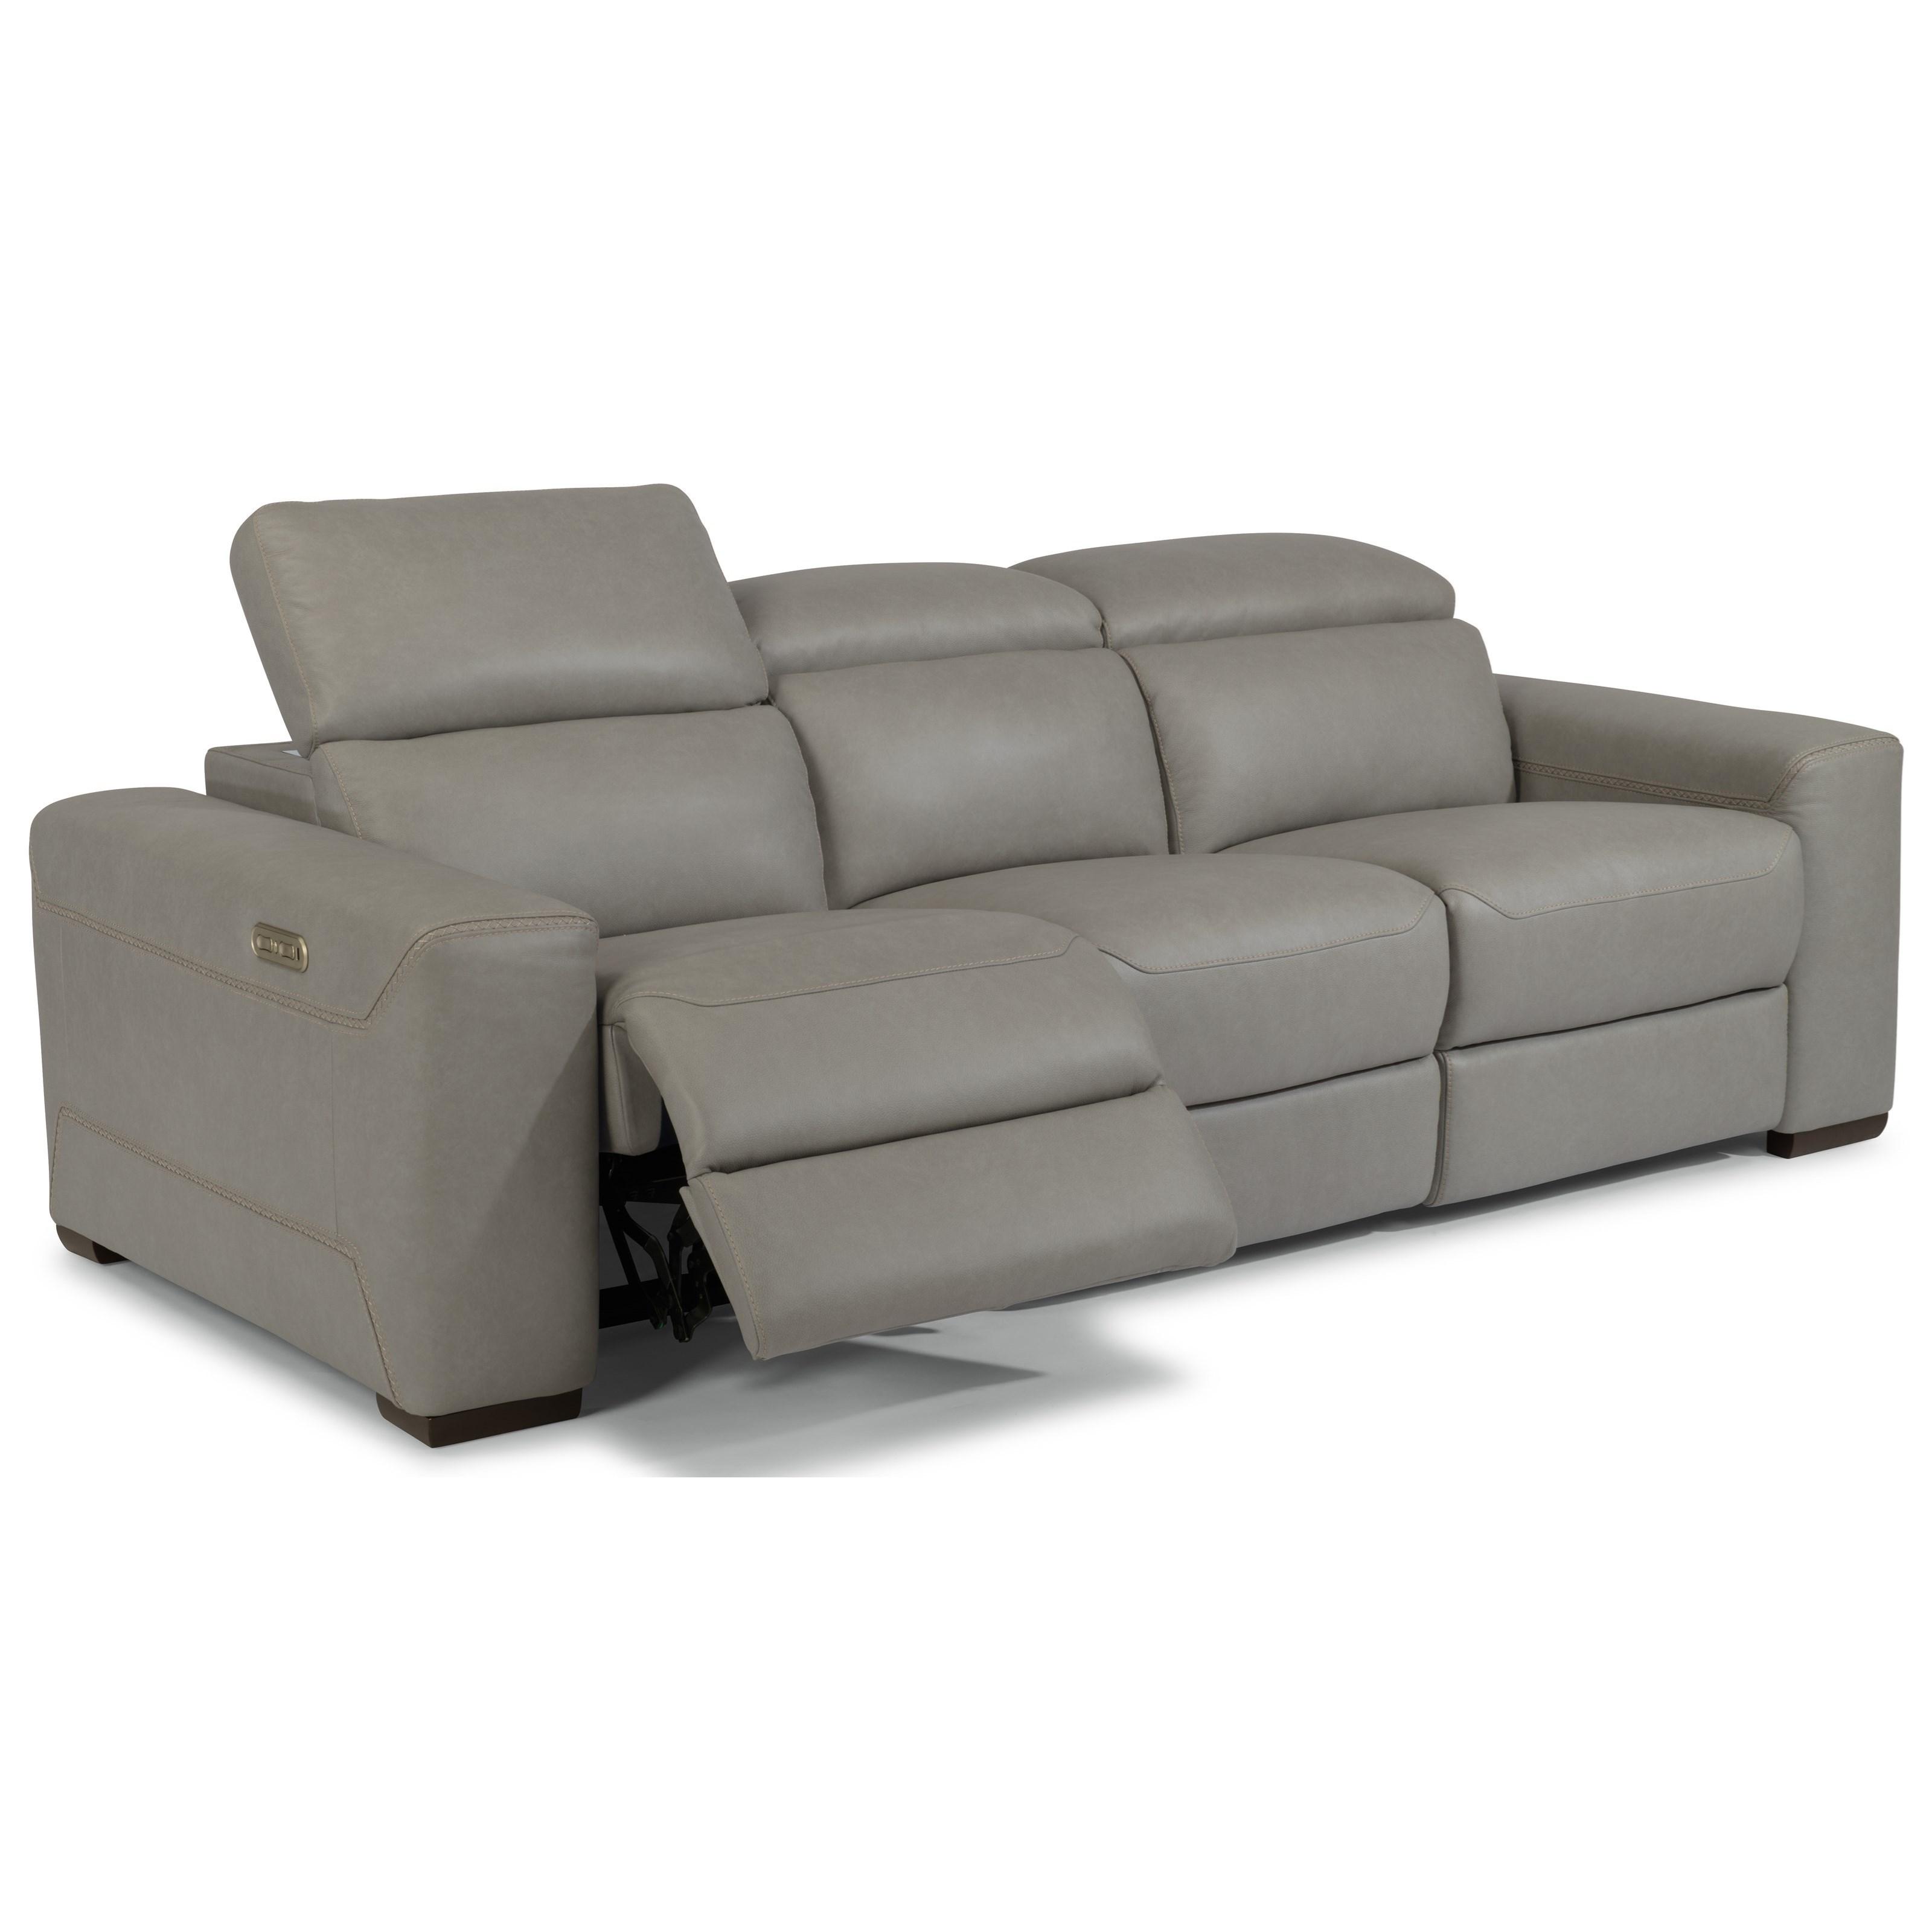 flexsteel lexon contemporary reclining sectional sofa with power rh dunkandbright com Power Reclining Sofa Power Reclining Sofa